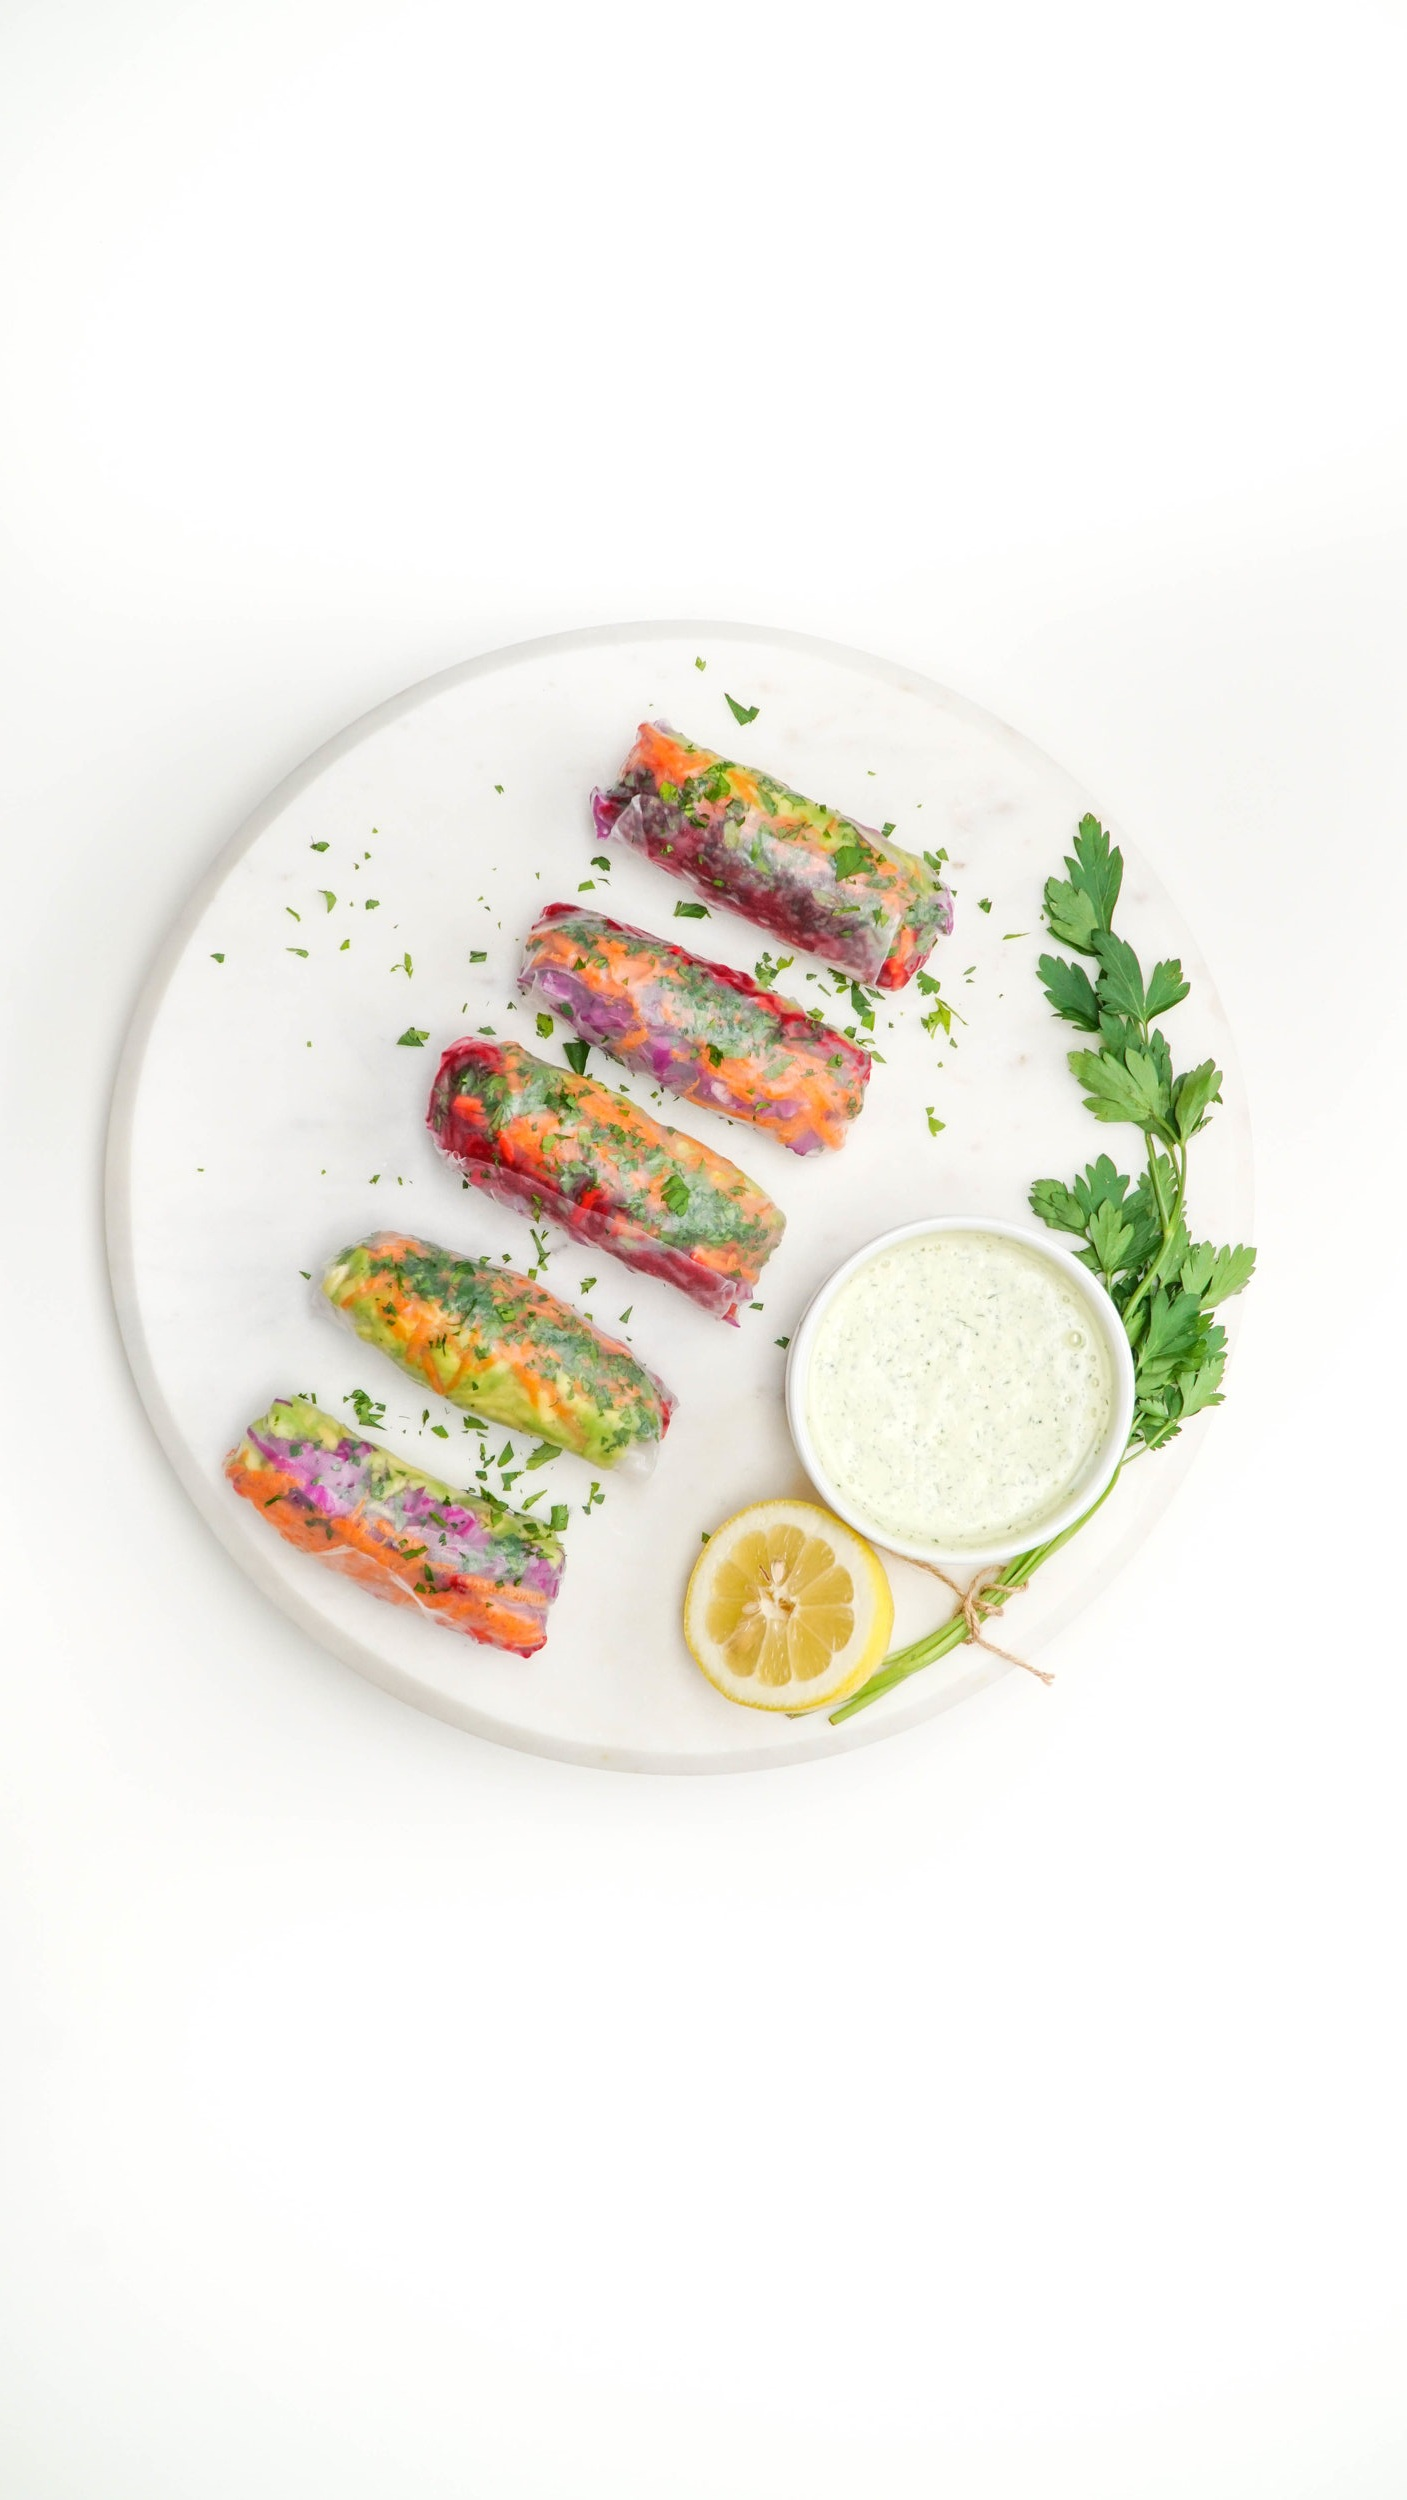 saladmenu raw vegetable rolls